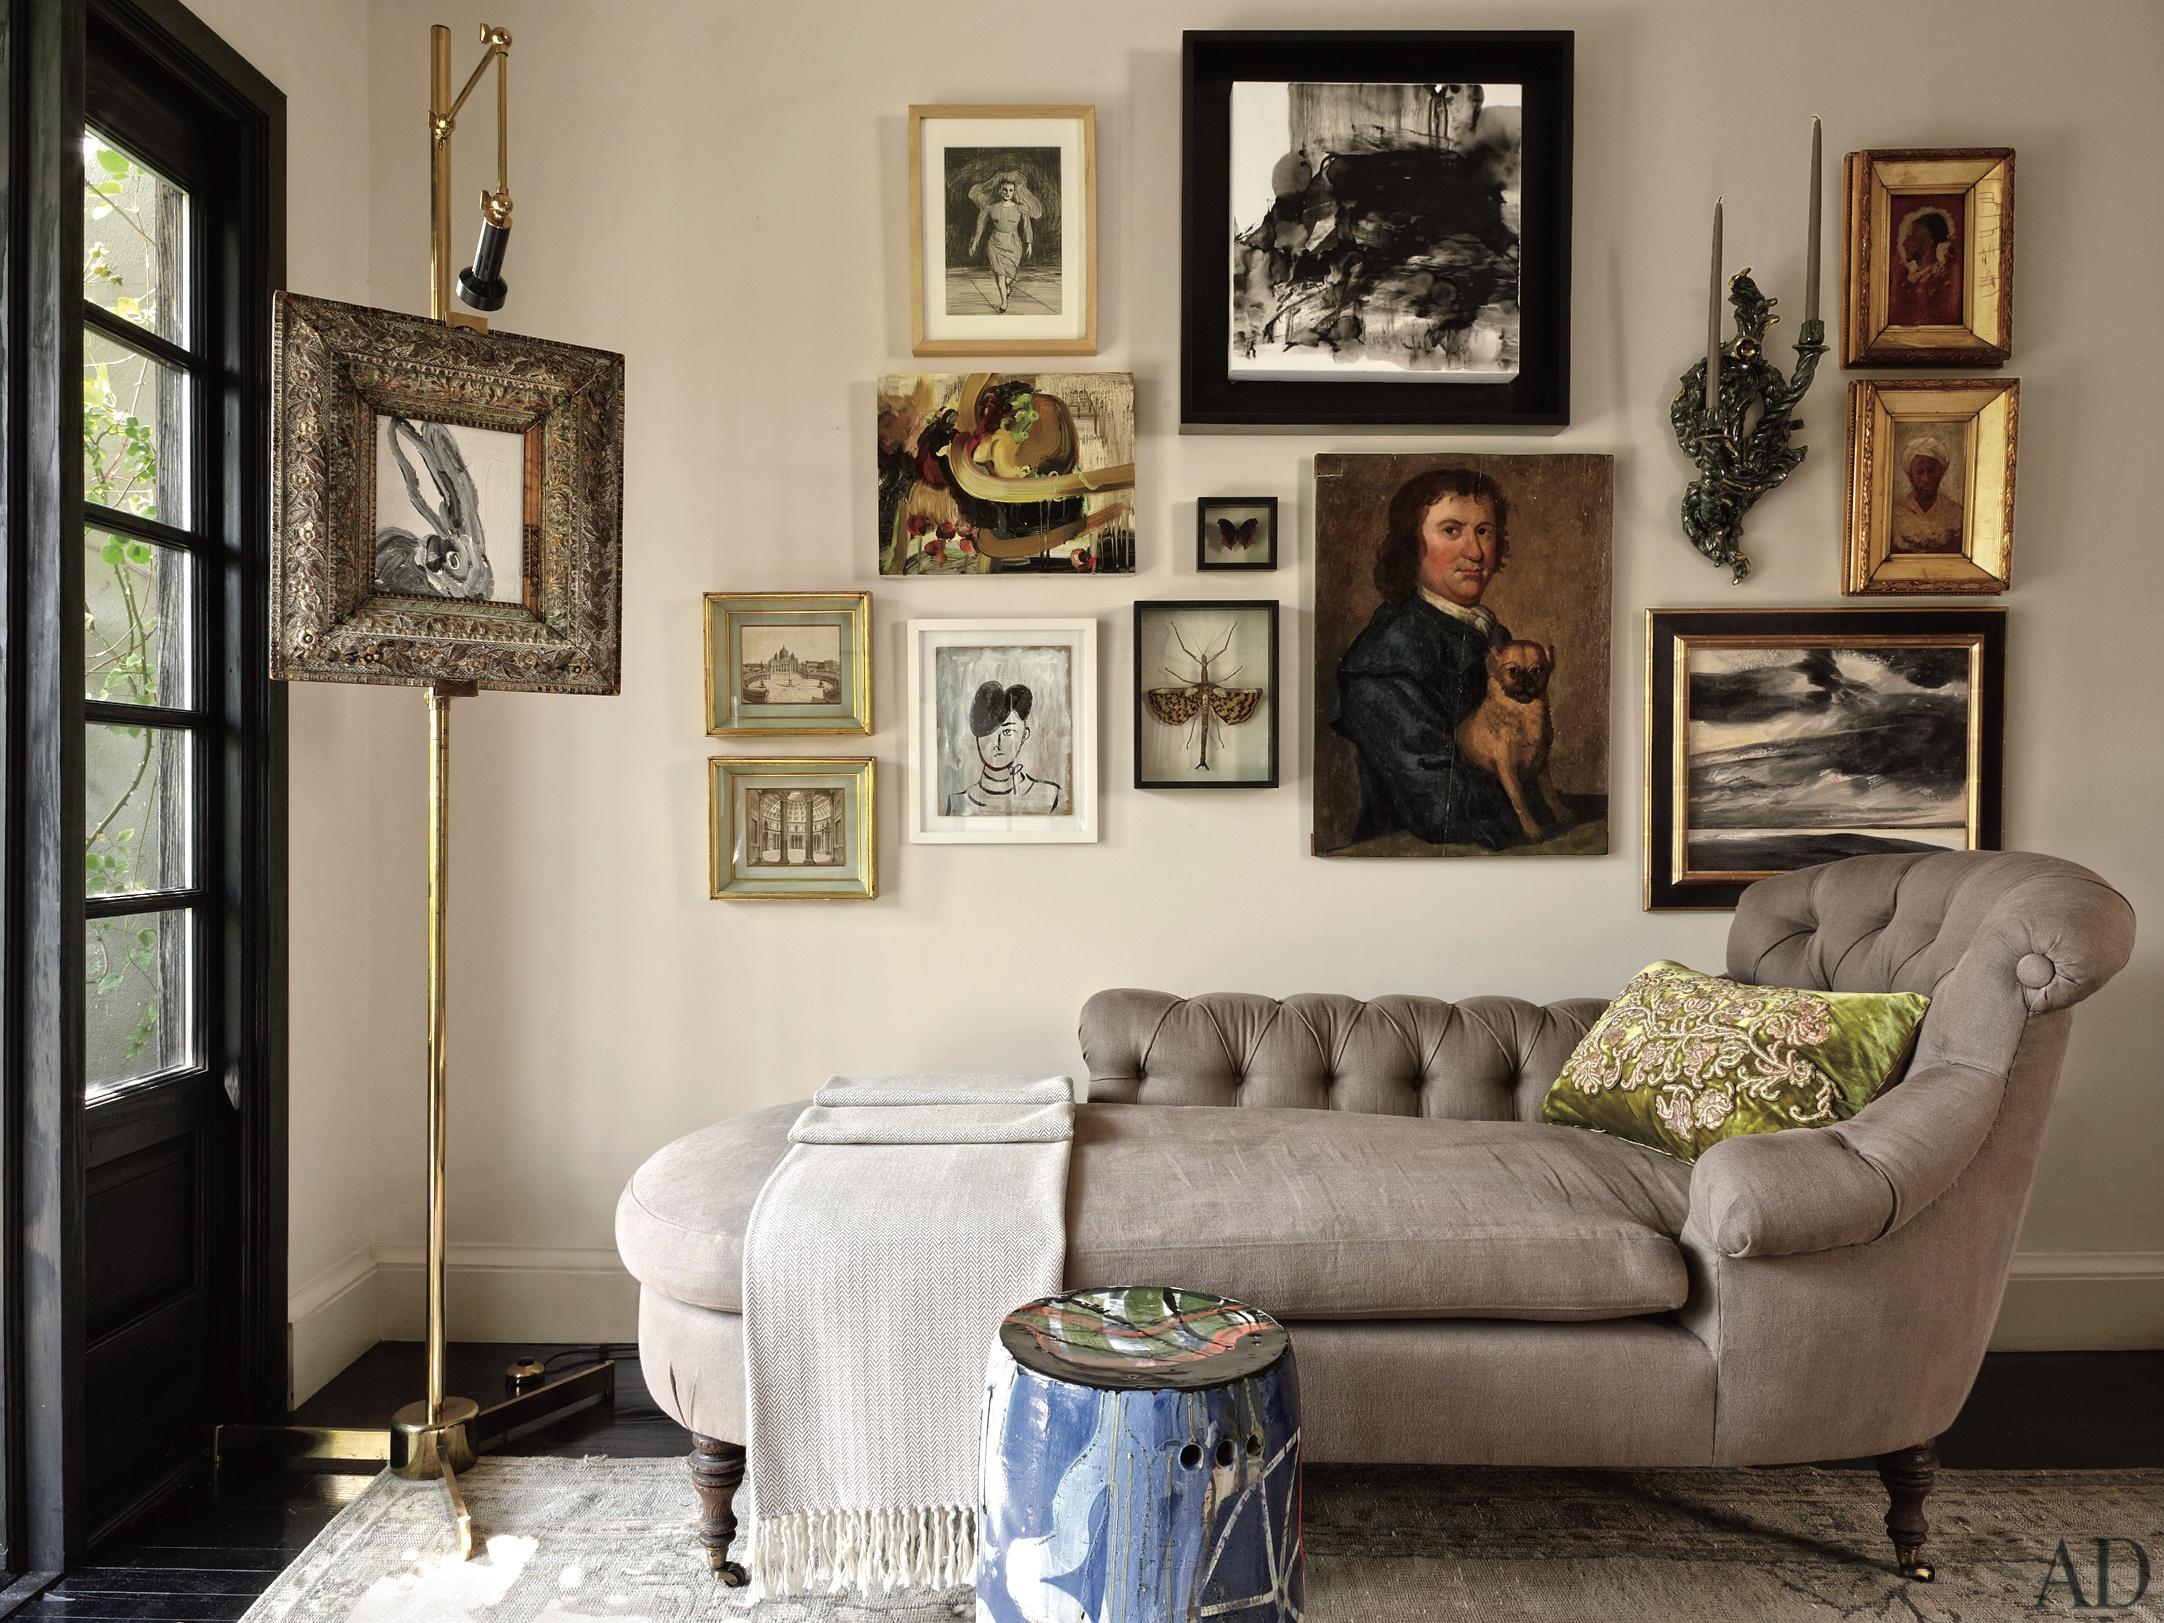 l'arte-e-di-casa-in-un-appartamento-a-manhattan